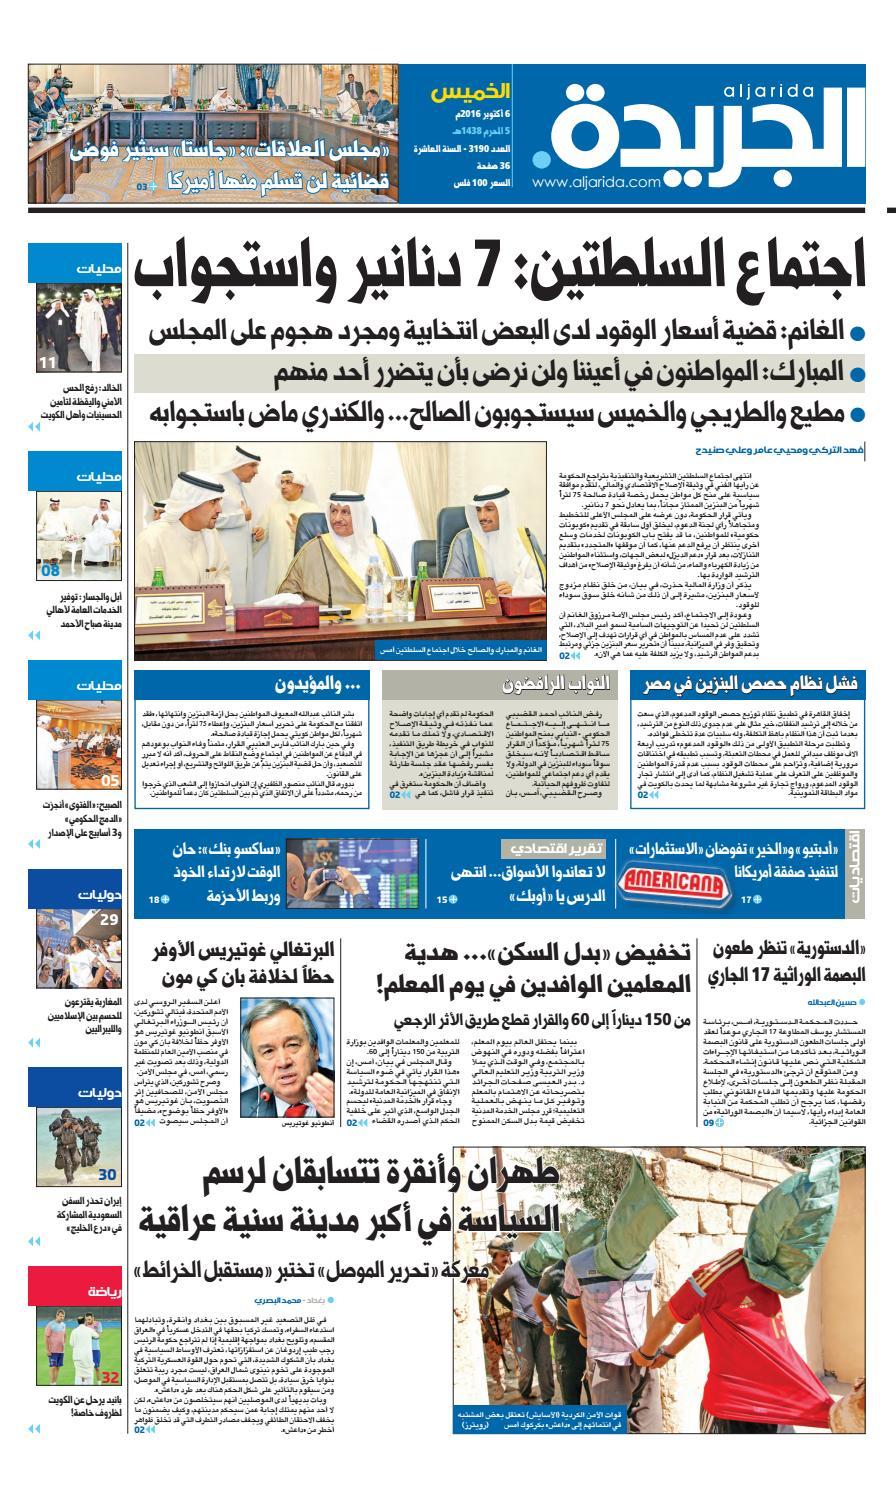 9737442cffa62 عدد الجريدة 06 أكتوبر 2016 by Aljarida Newspaper - issuu